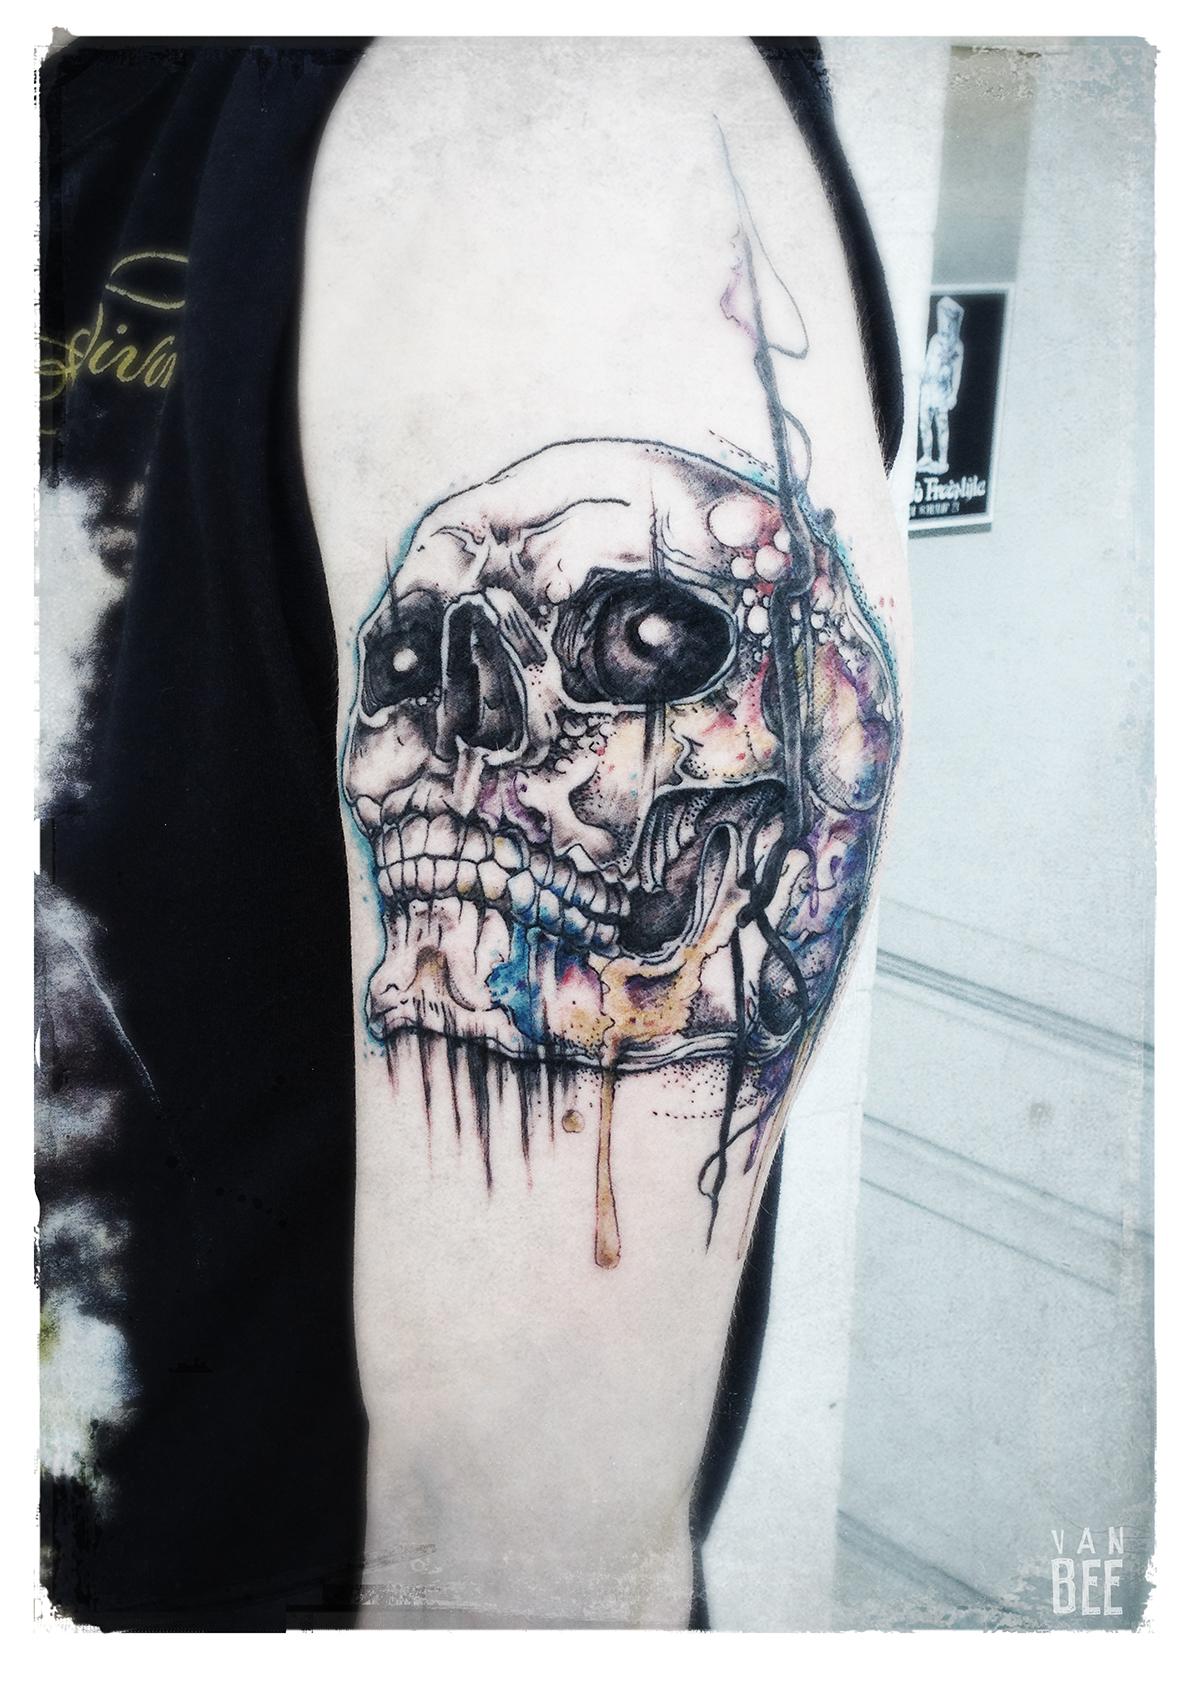 Van Bee, tattoo artist - the vandallist (6)